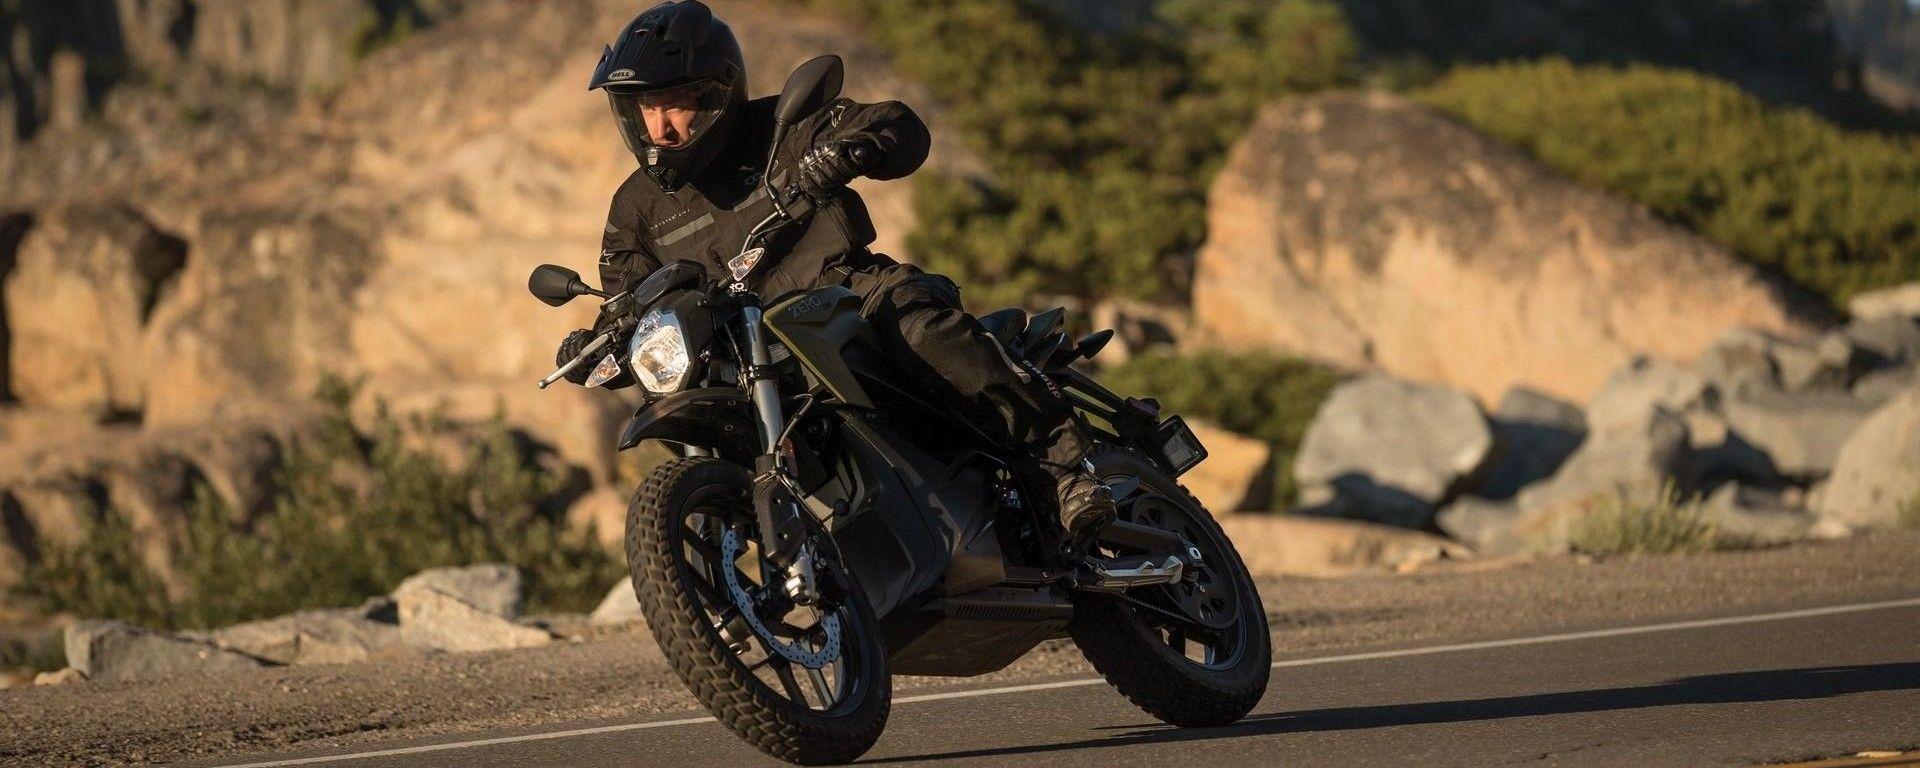 Zero Motorcycle DSR Black Forest: la dual sport elettrica